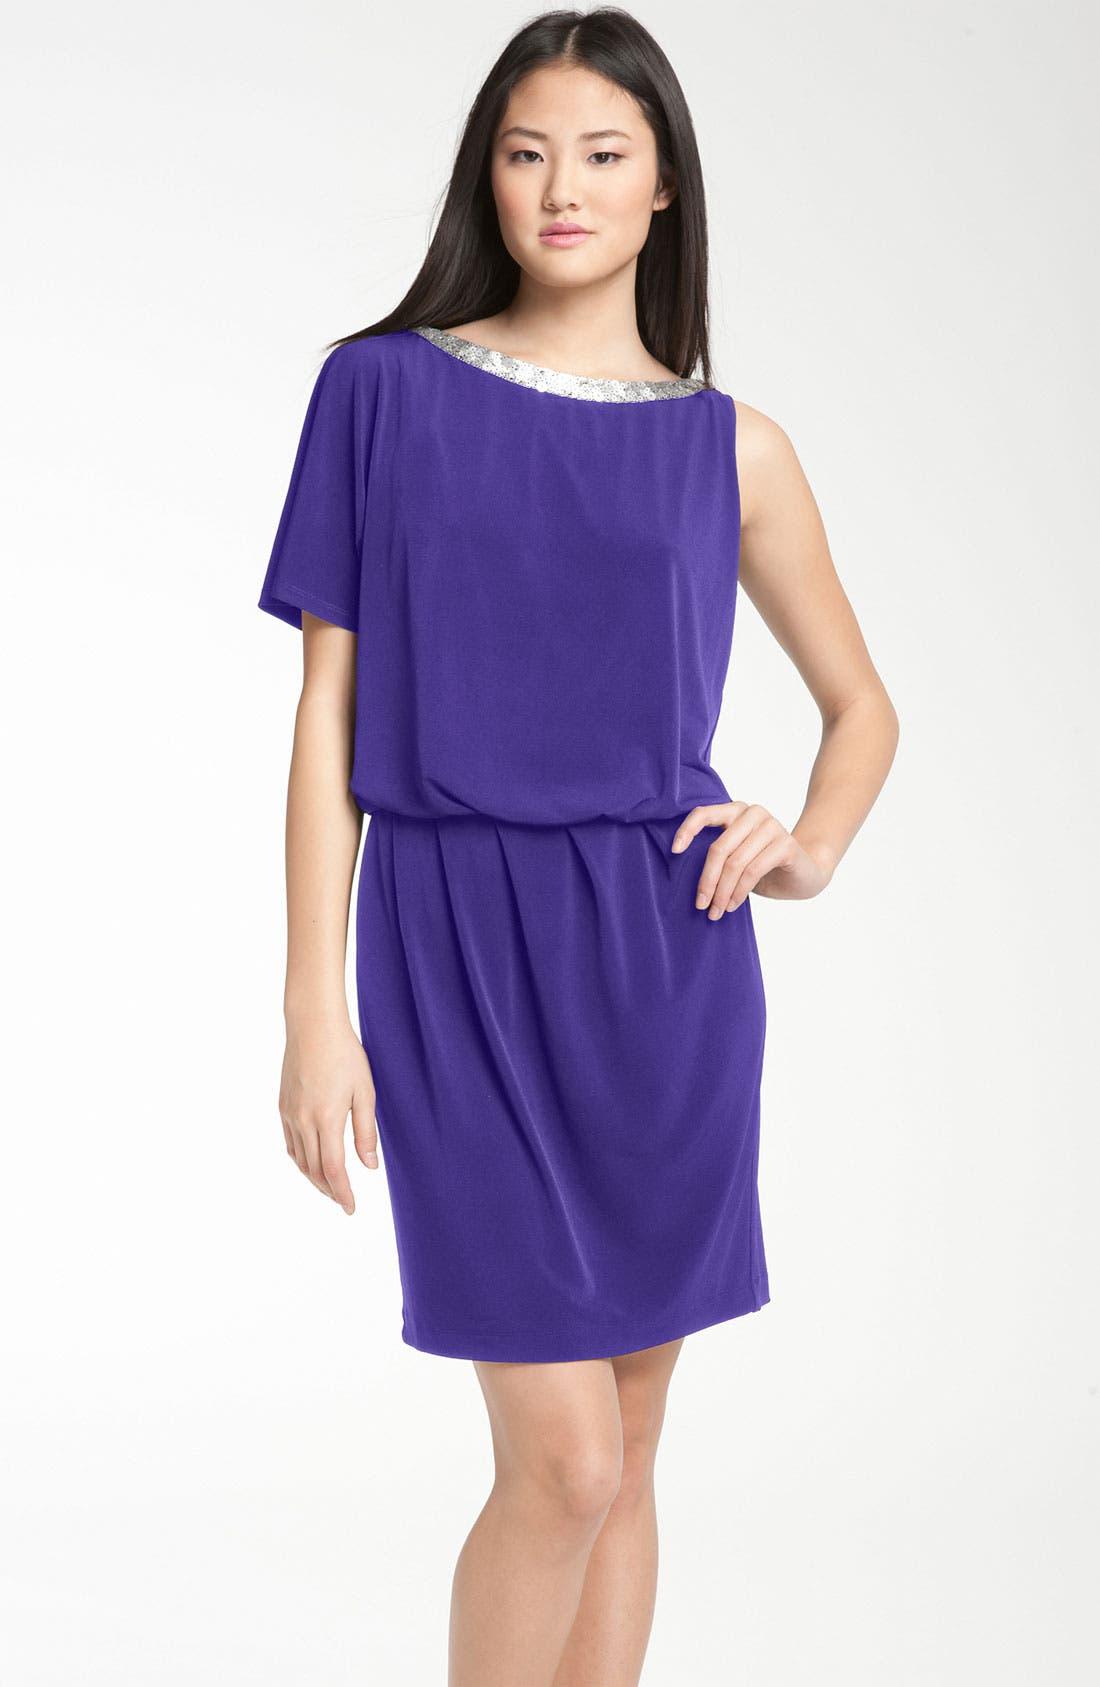 Alternate Image 1 Selected - Donna Ricco Asymmetrical Jersey Blouson Dress